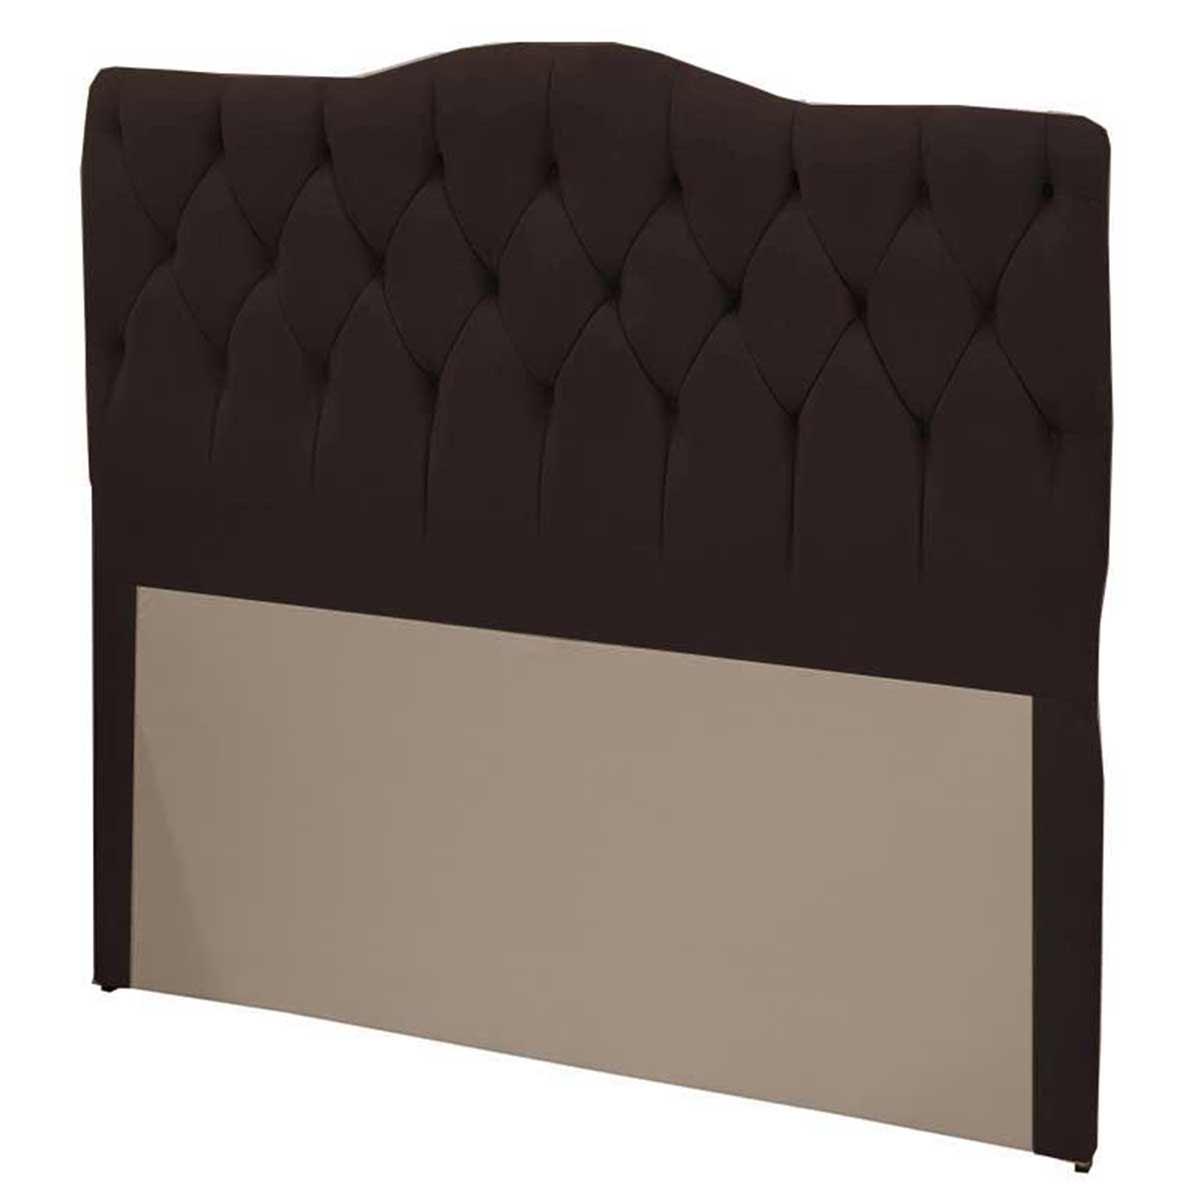 Cabeceira Casal Estofada Luxury 140 cm Suede Negro Simbal